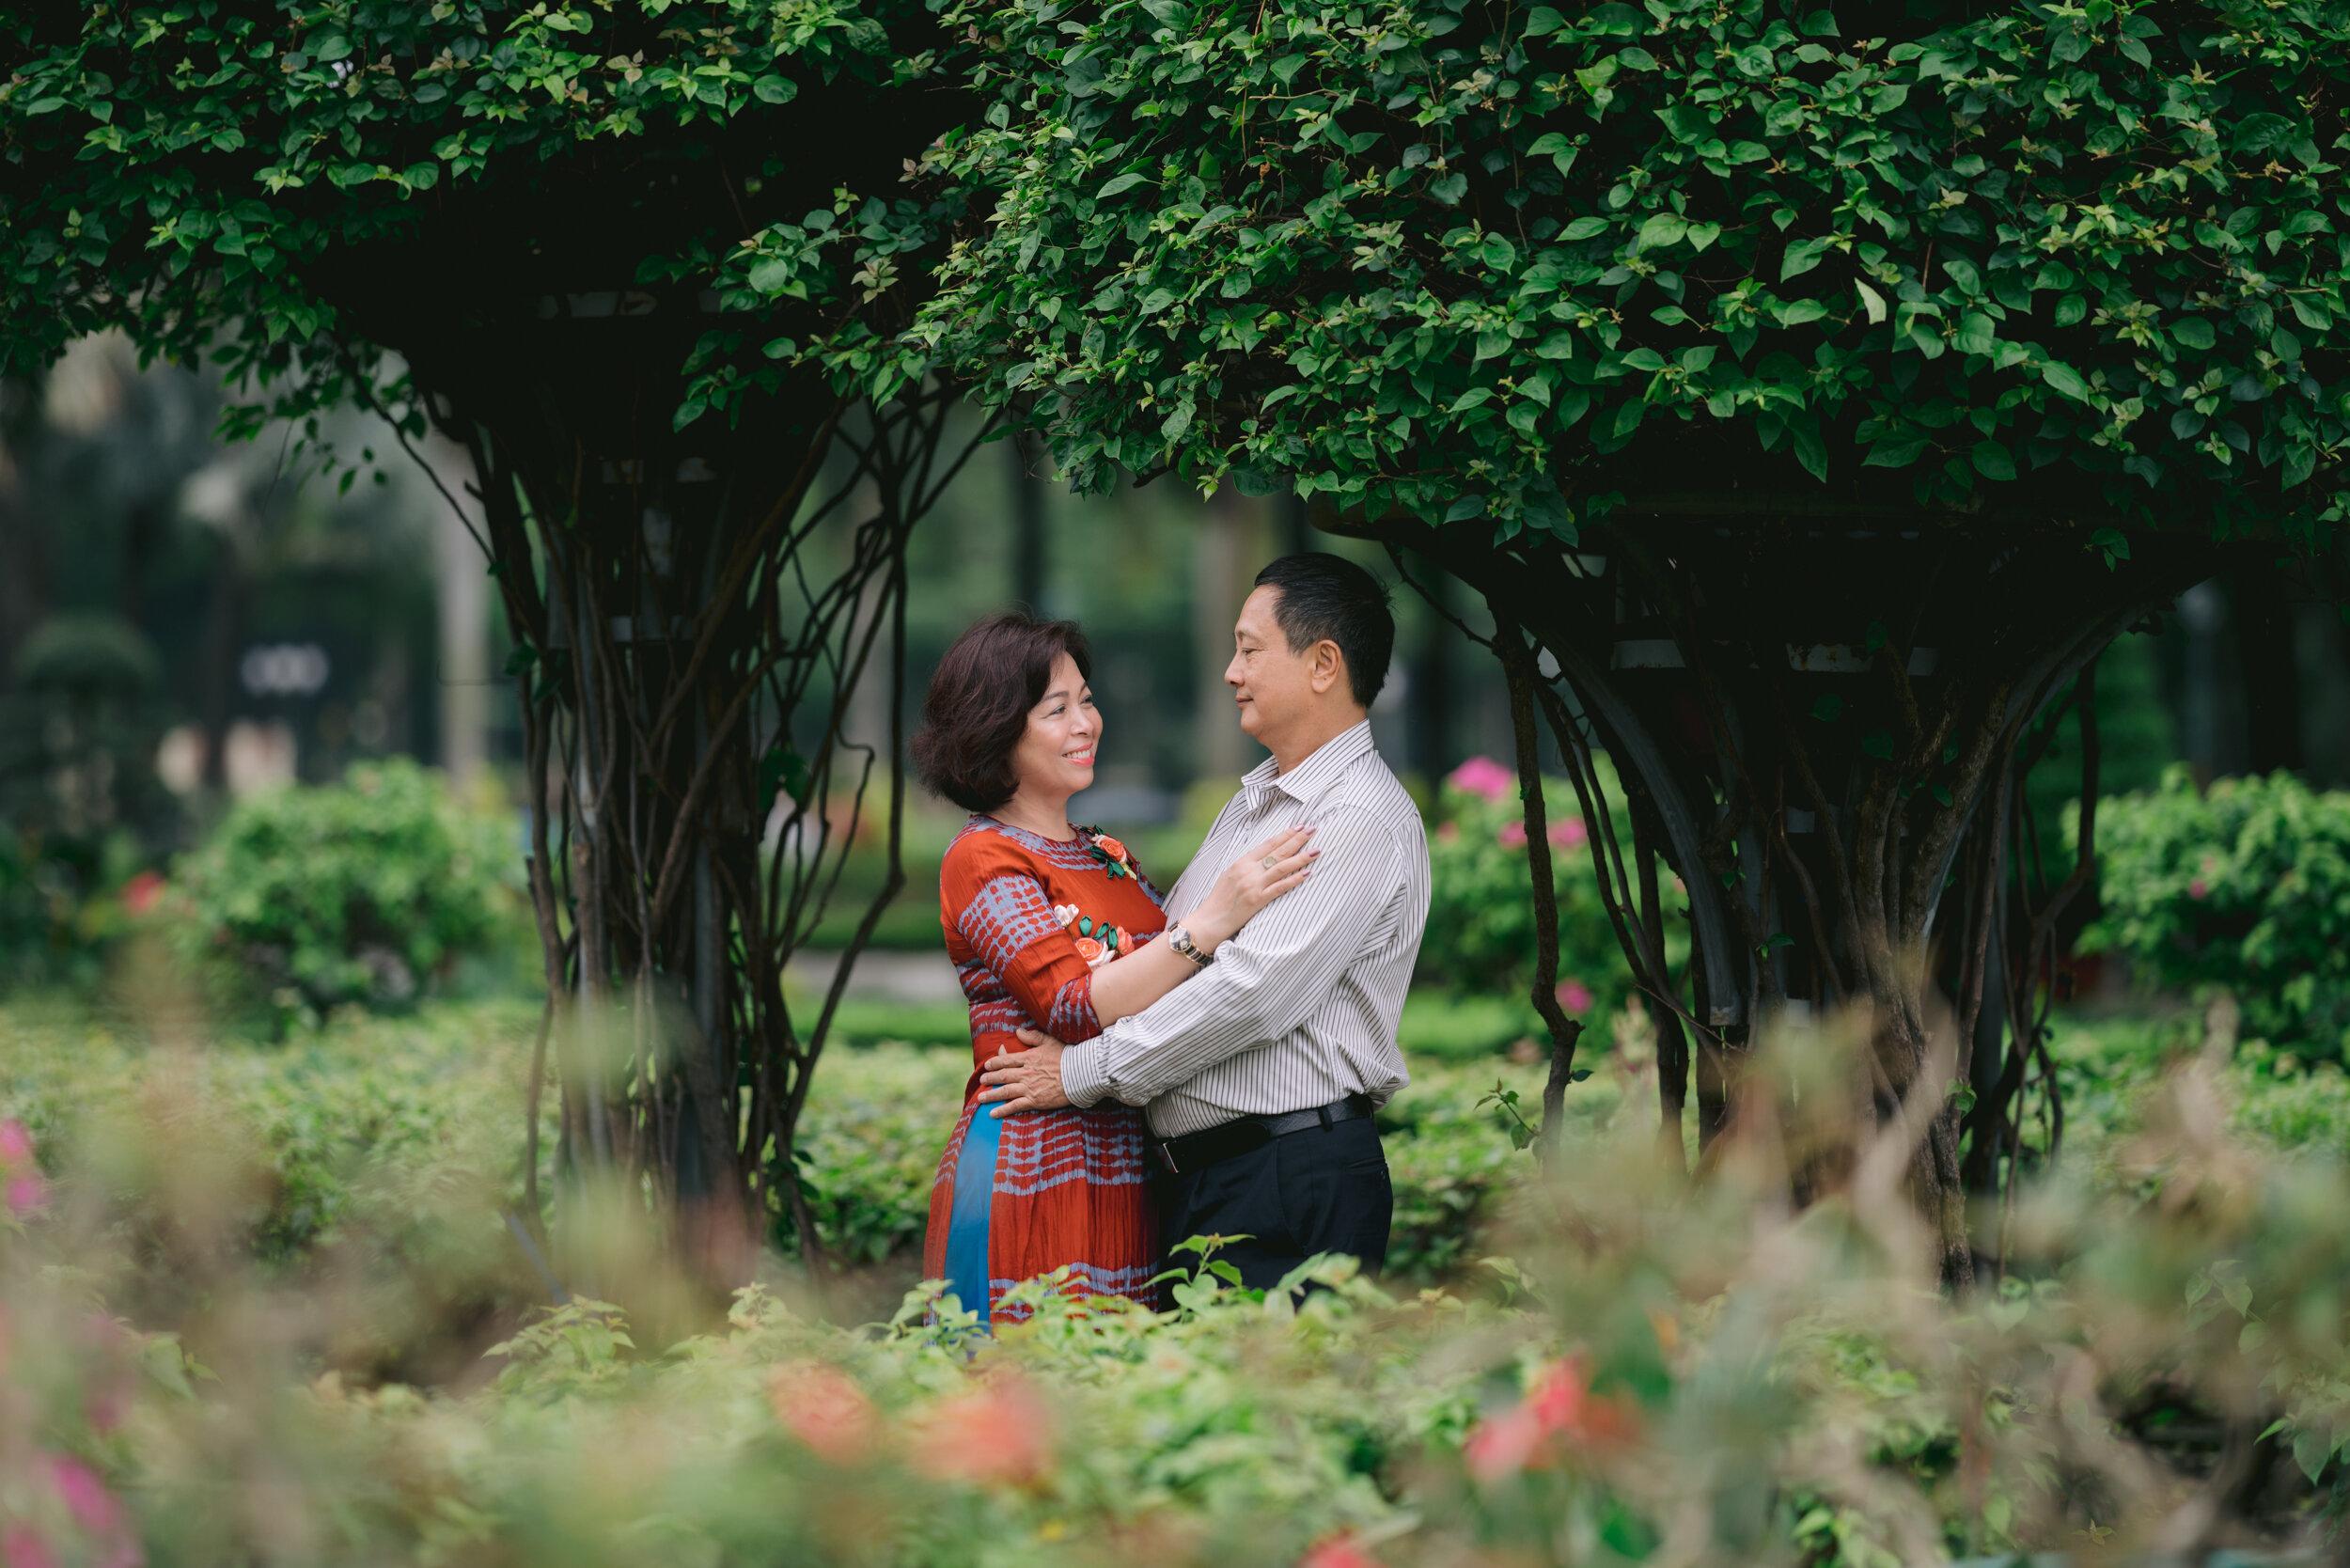 Mr & Mrs Do | Portraits - Aug 15, 2019